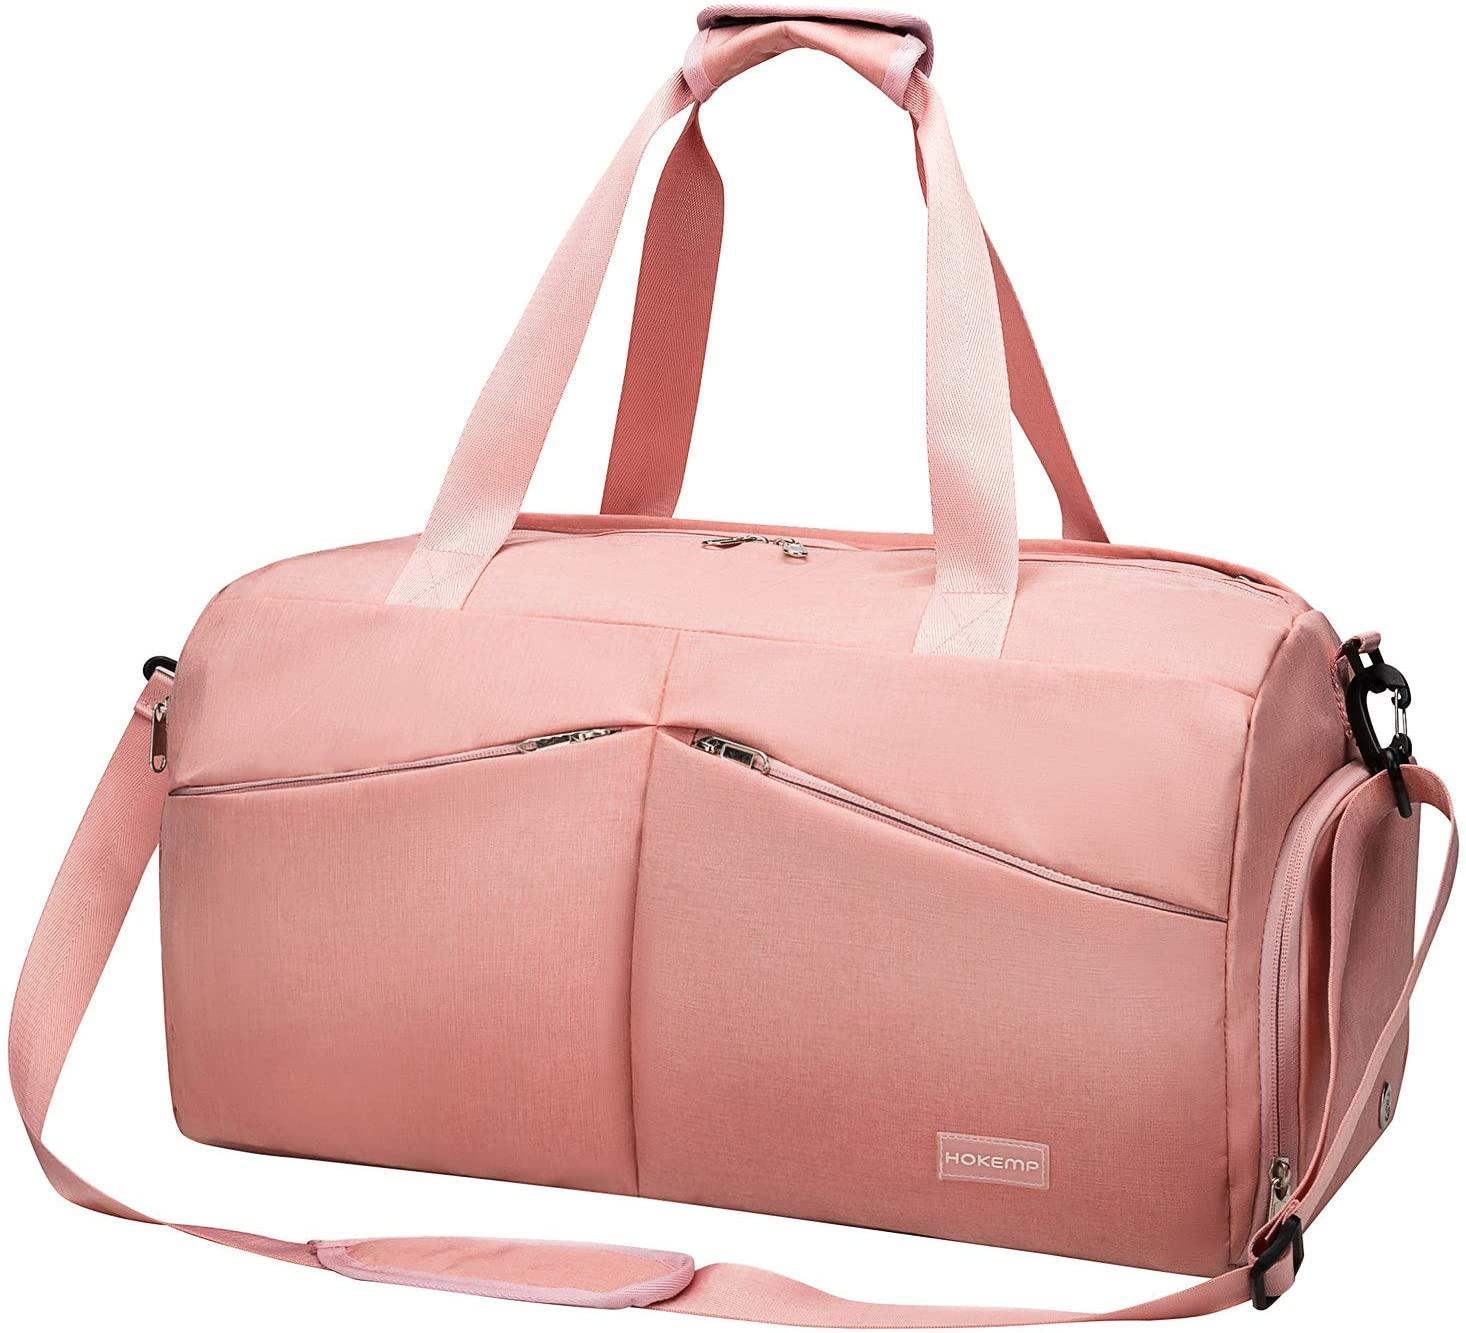 9. HOKEMP Sports Gym Bag Travel Duffel